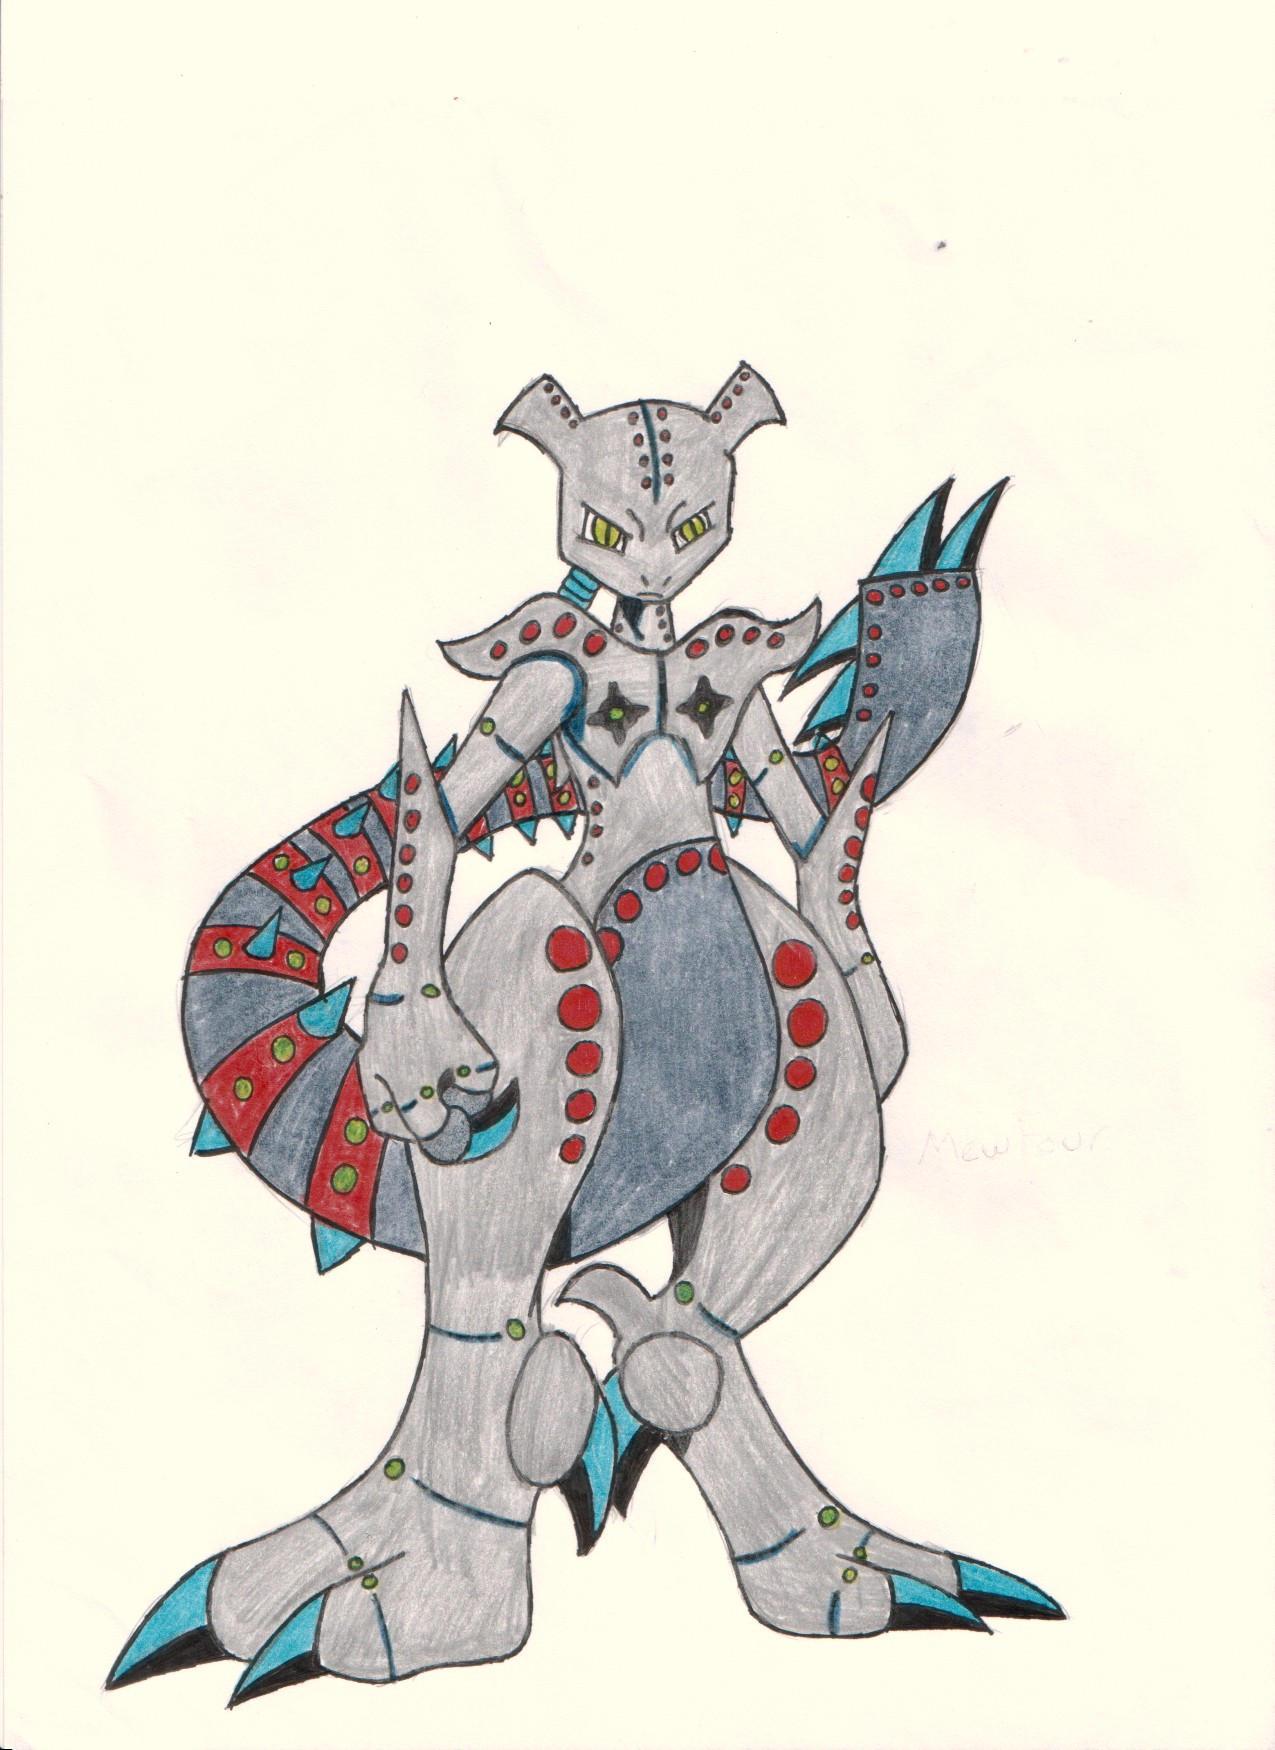 Mewthree Robot Form by yodana on DeviantArt